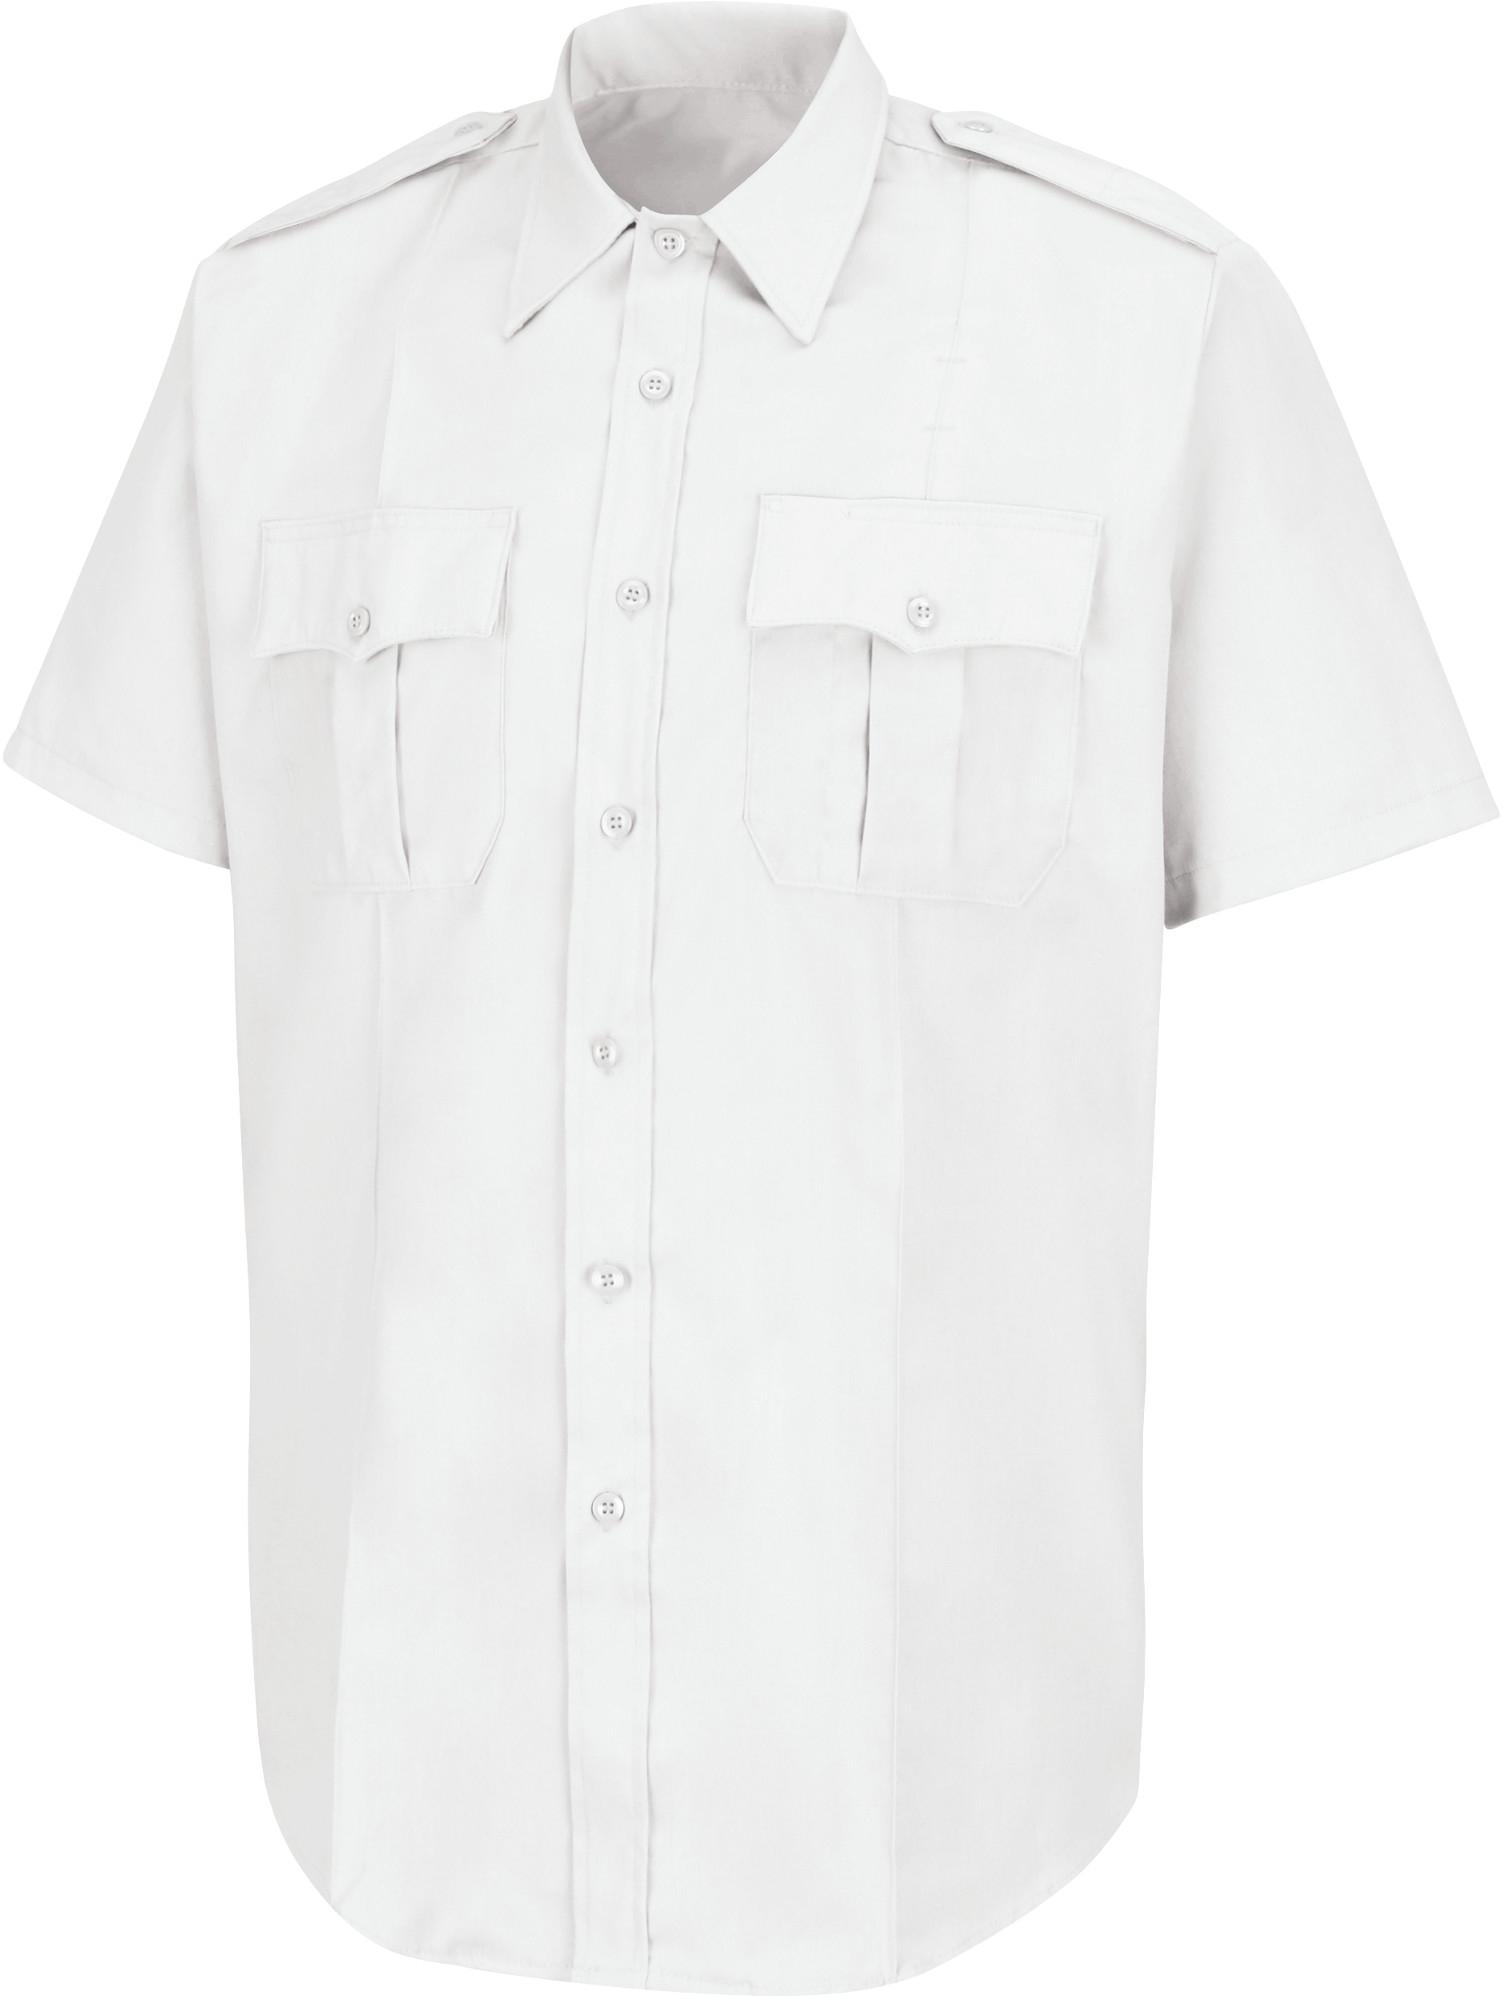 Horace Small Sentry Action Option Shirt 1733 Dark Navy